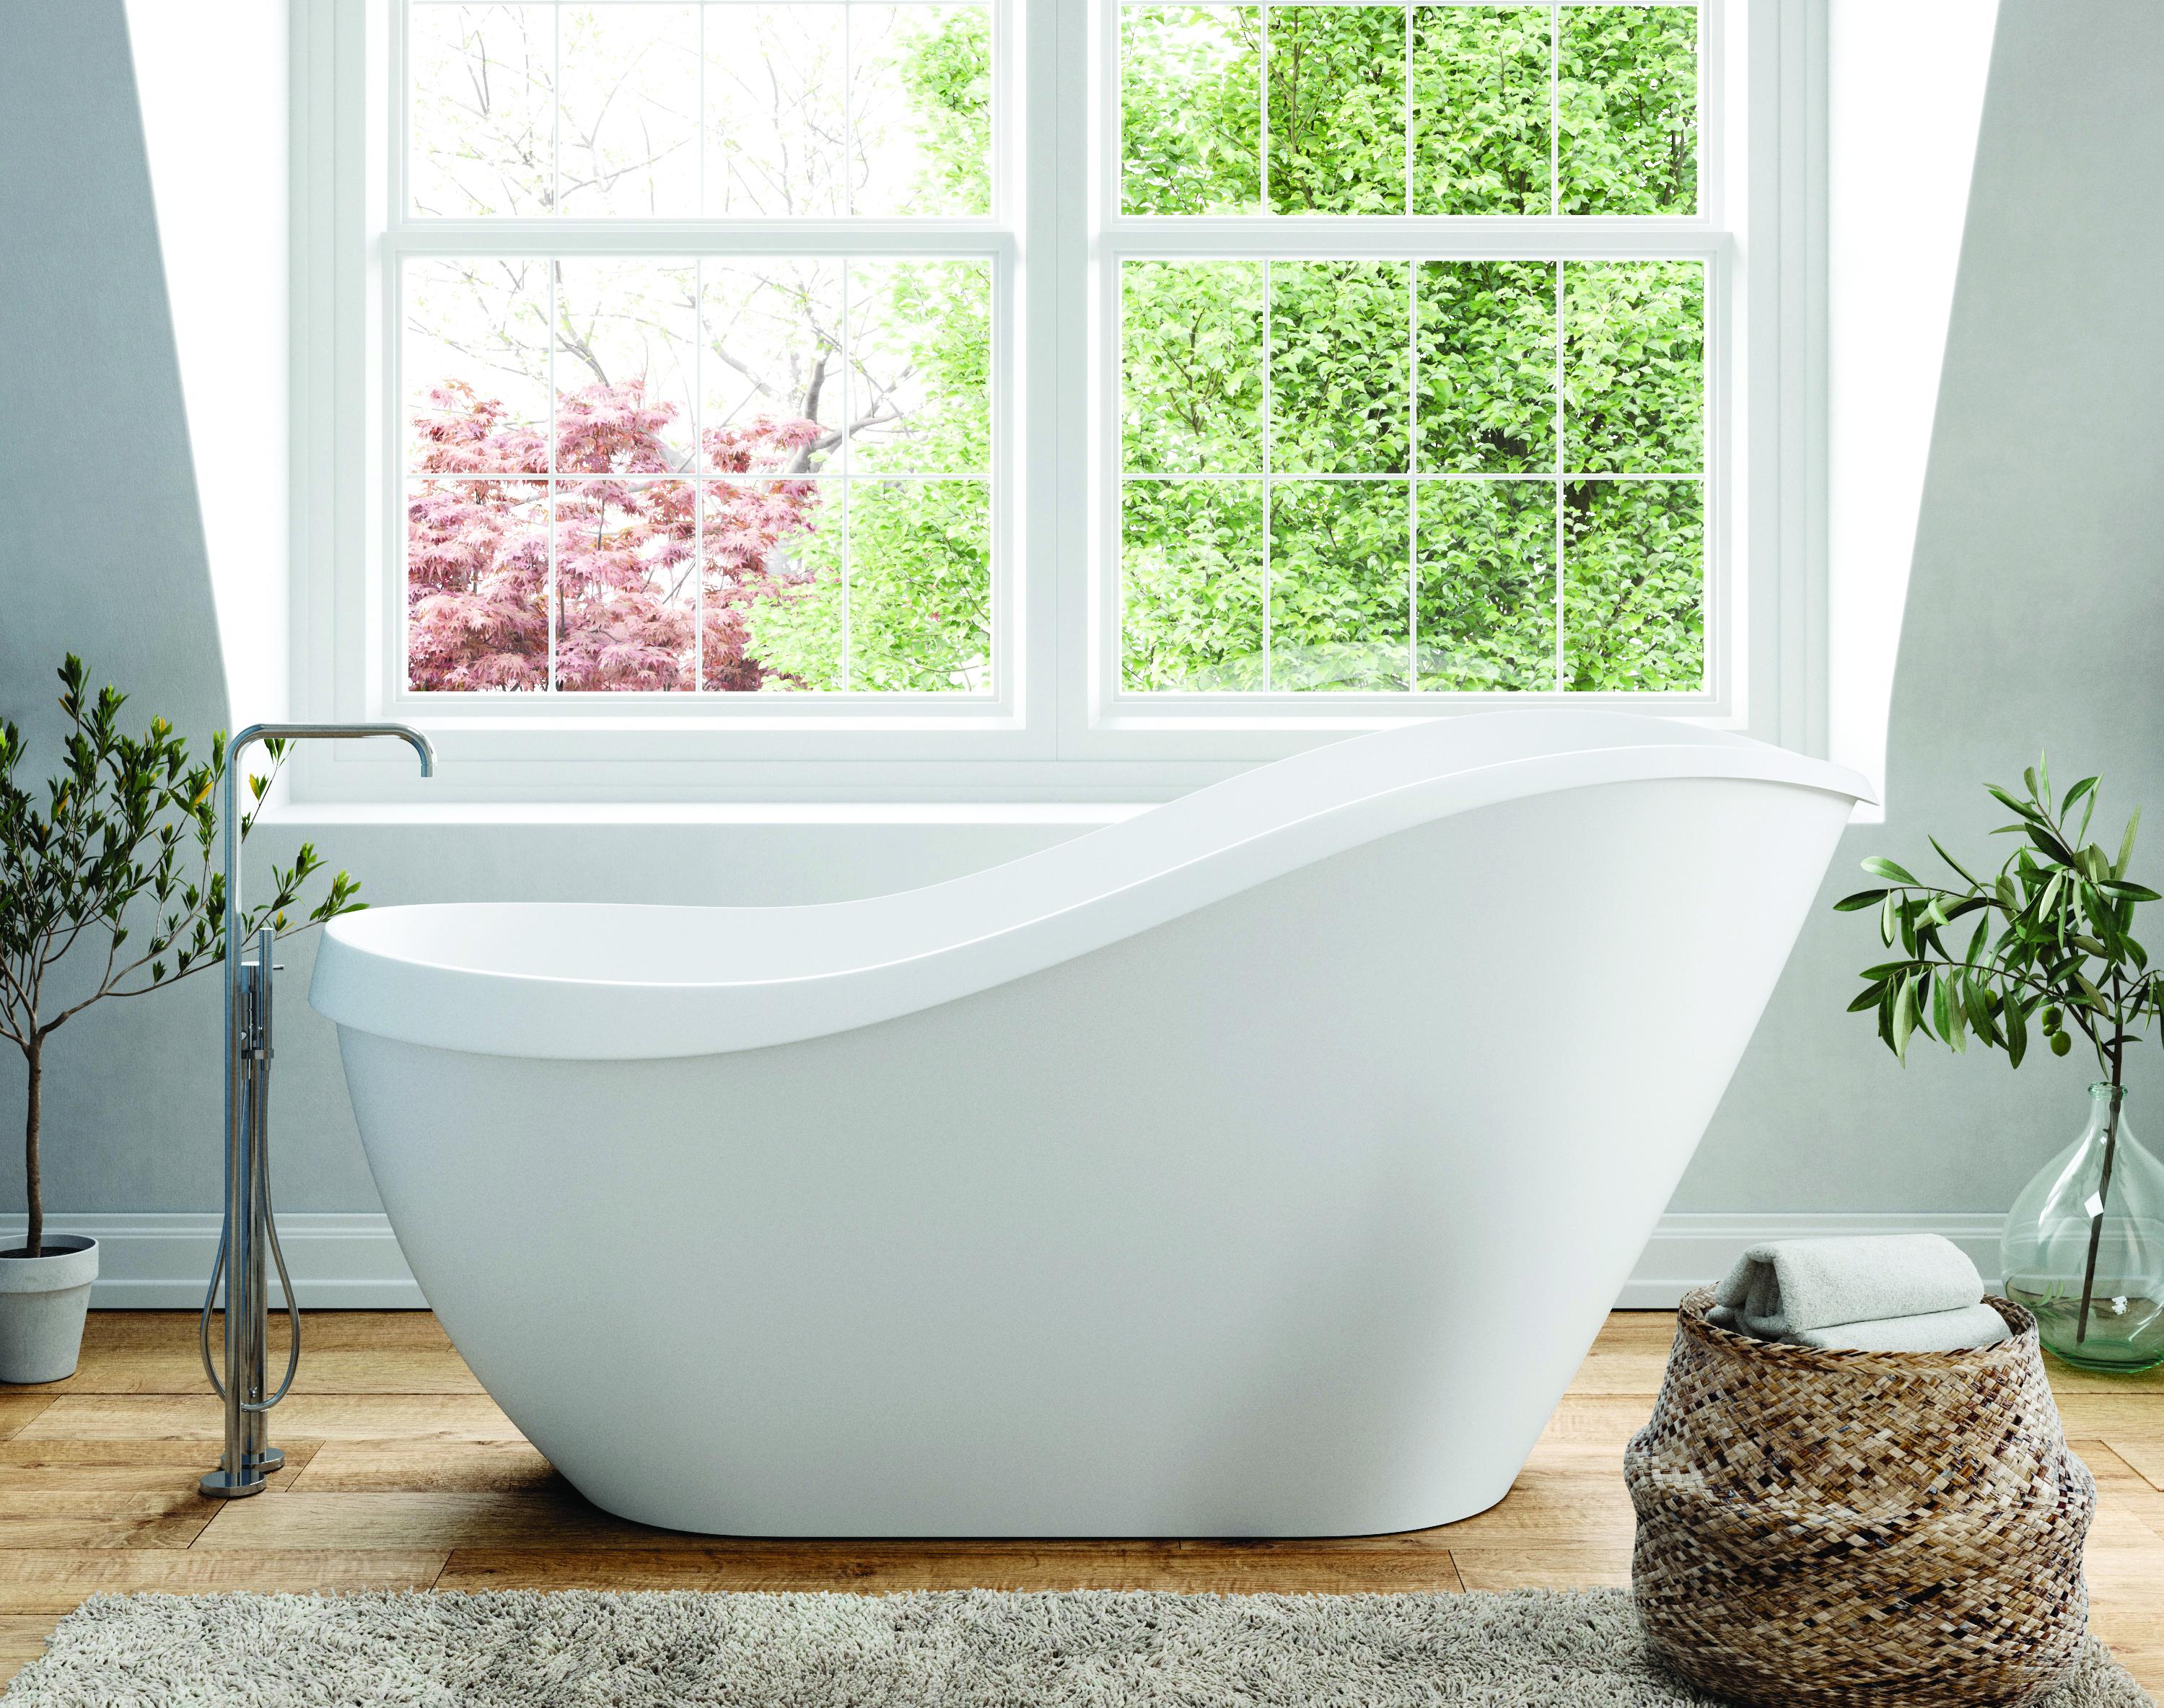 TW0421_Acquabella-Serena-bathtub.jpg